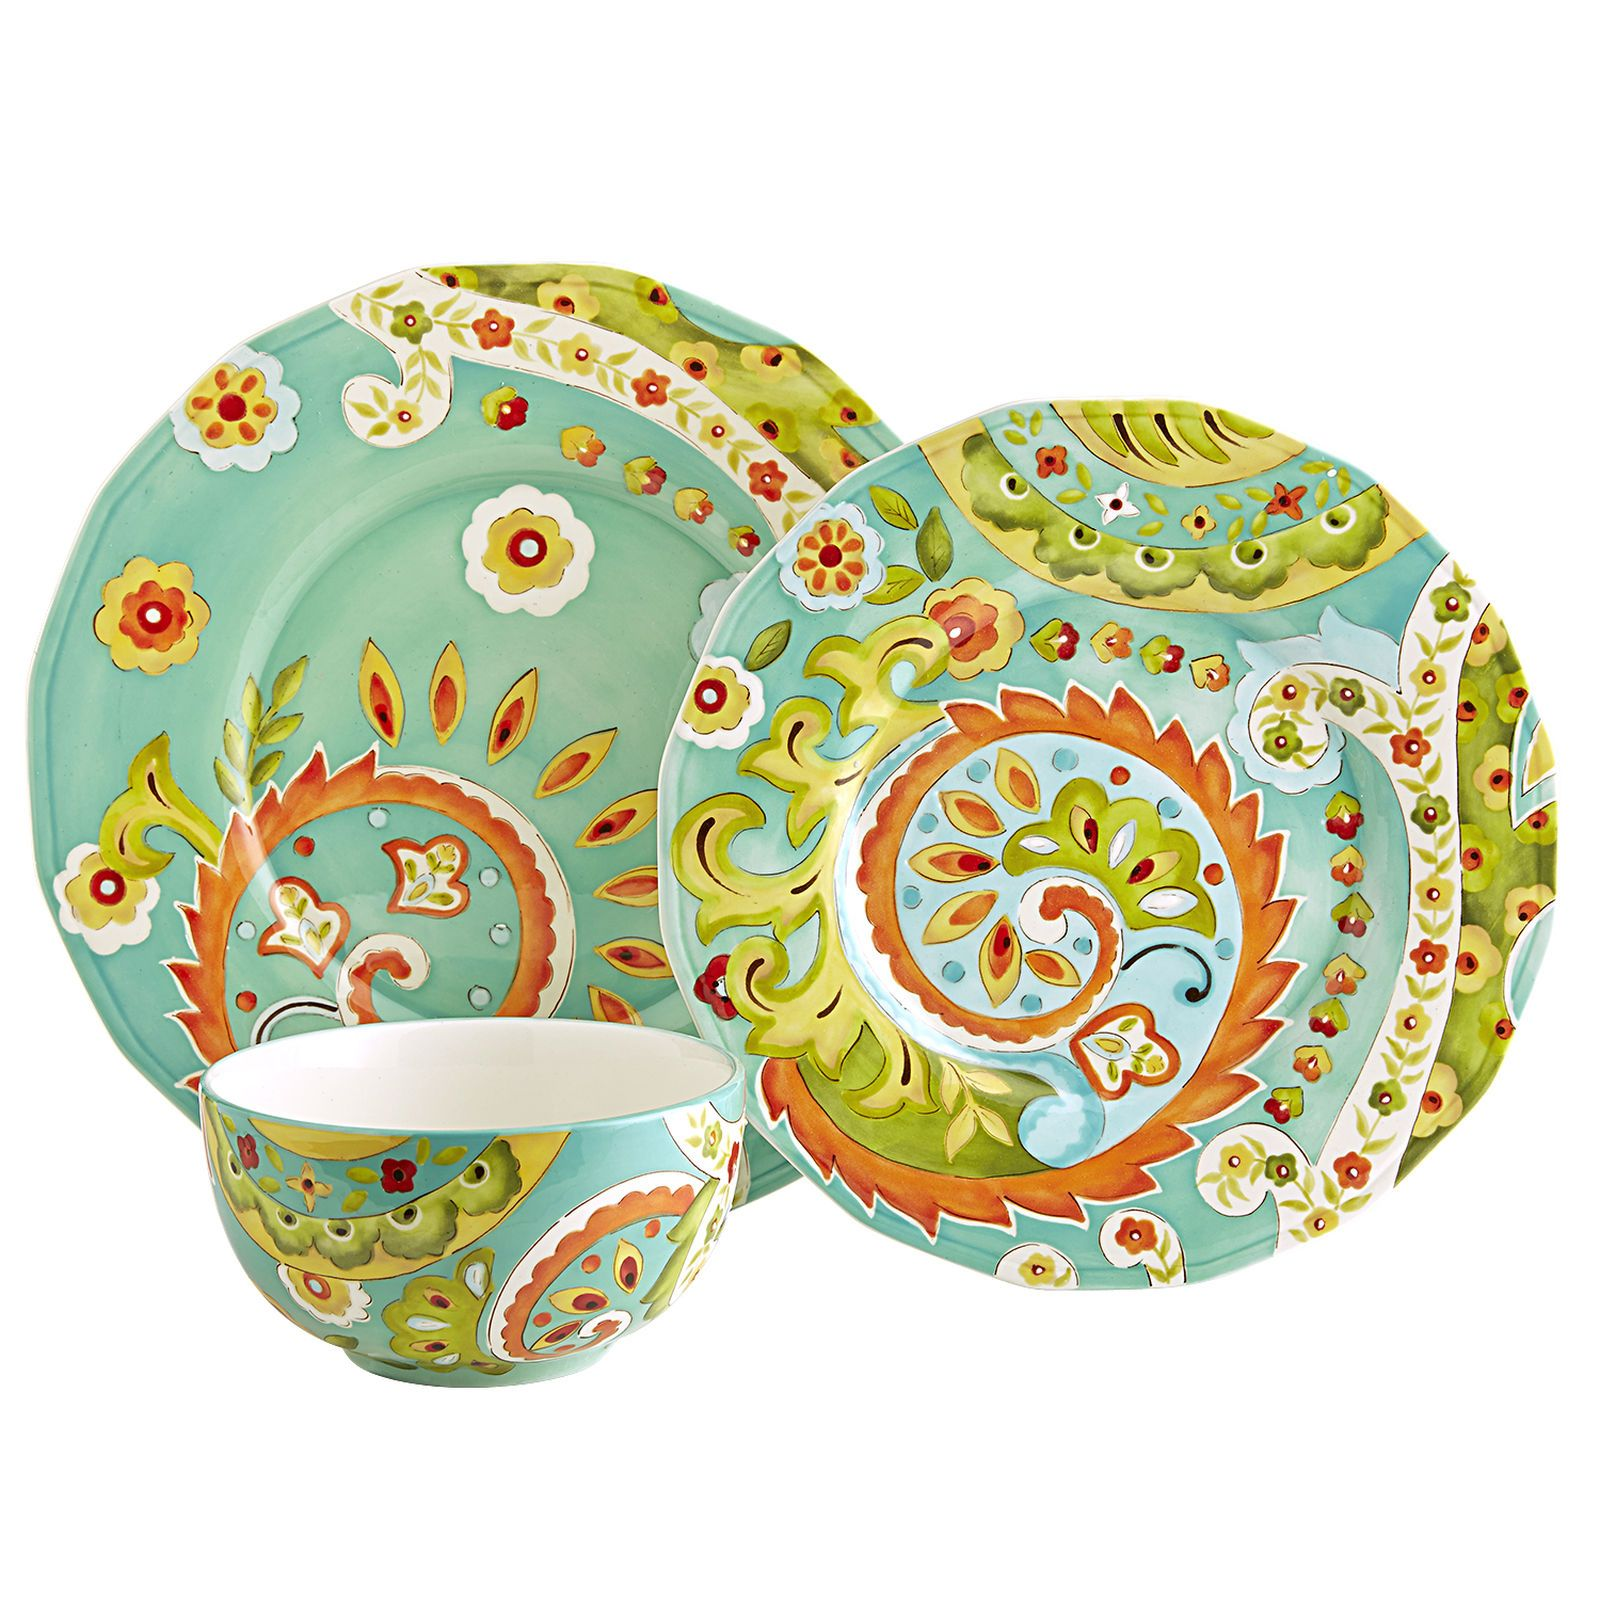 Bianca Paisley Dinnerware Dinner Plates (2), Salad Plates (2)